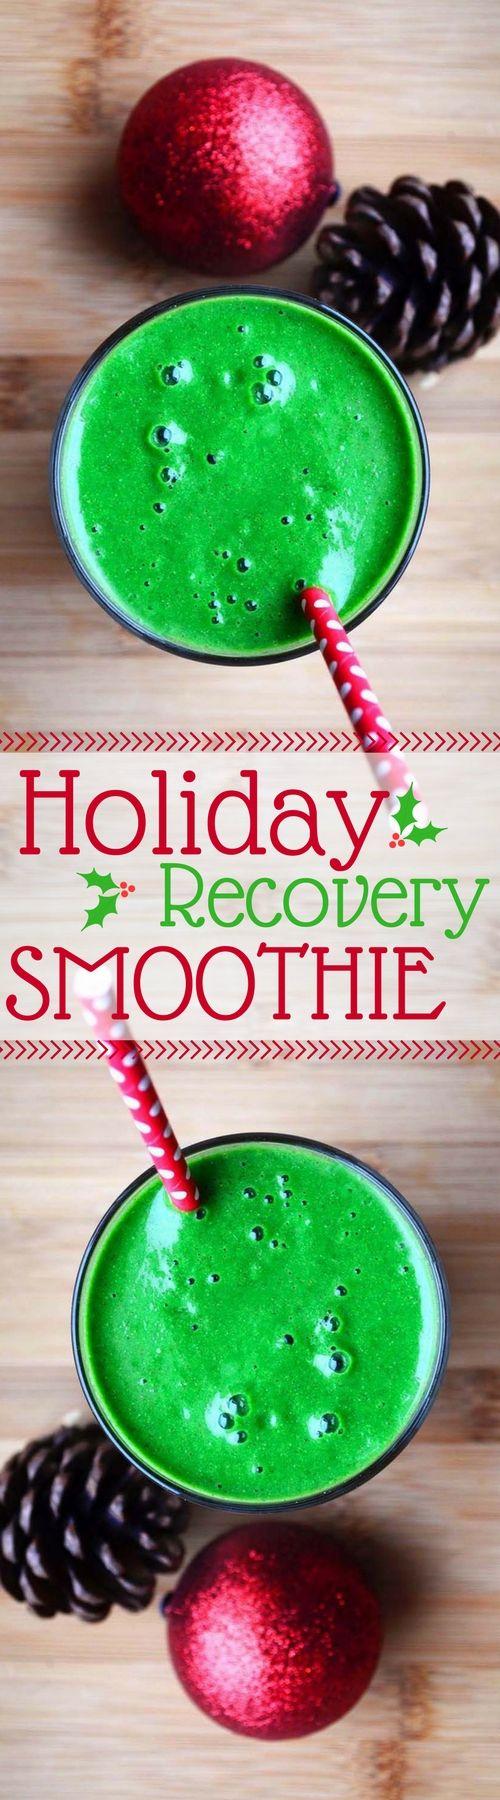 green smoothie recipe, detox recipes, detox smoothie, cleansing smoothie, vegan gluten free recipes